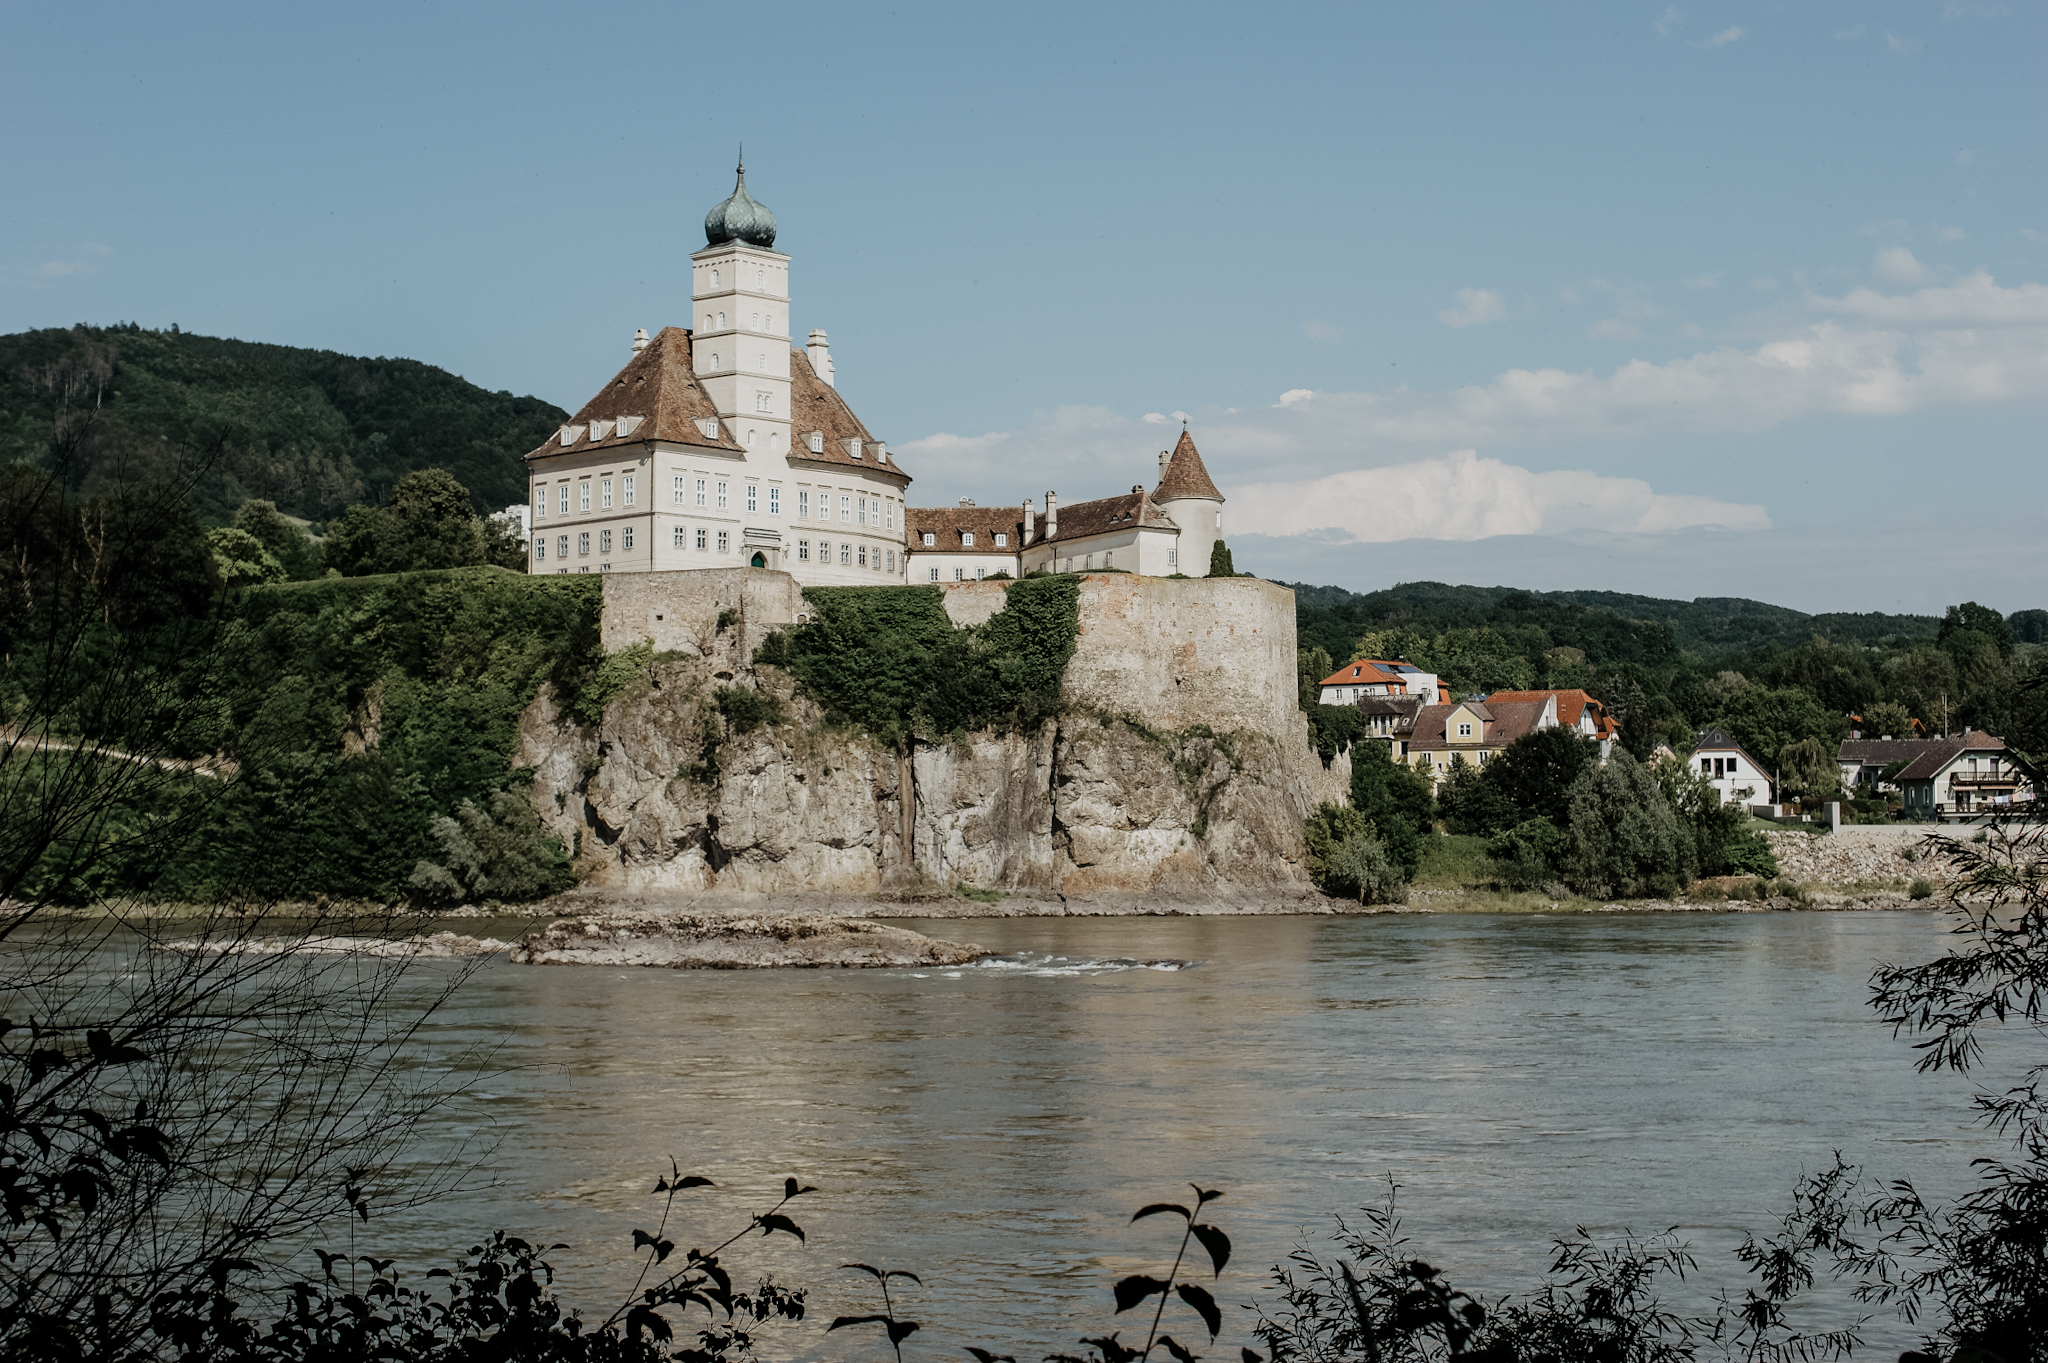 Schloss Schönbühel, Wachau